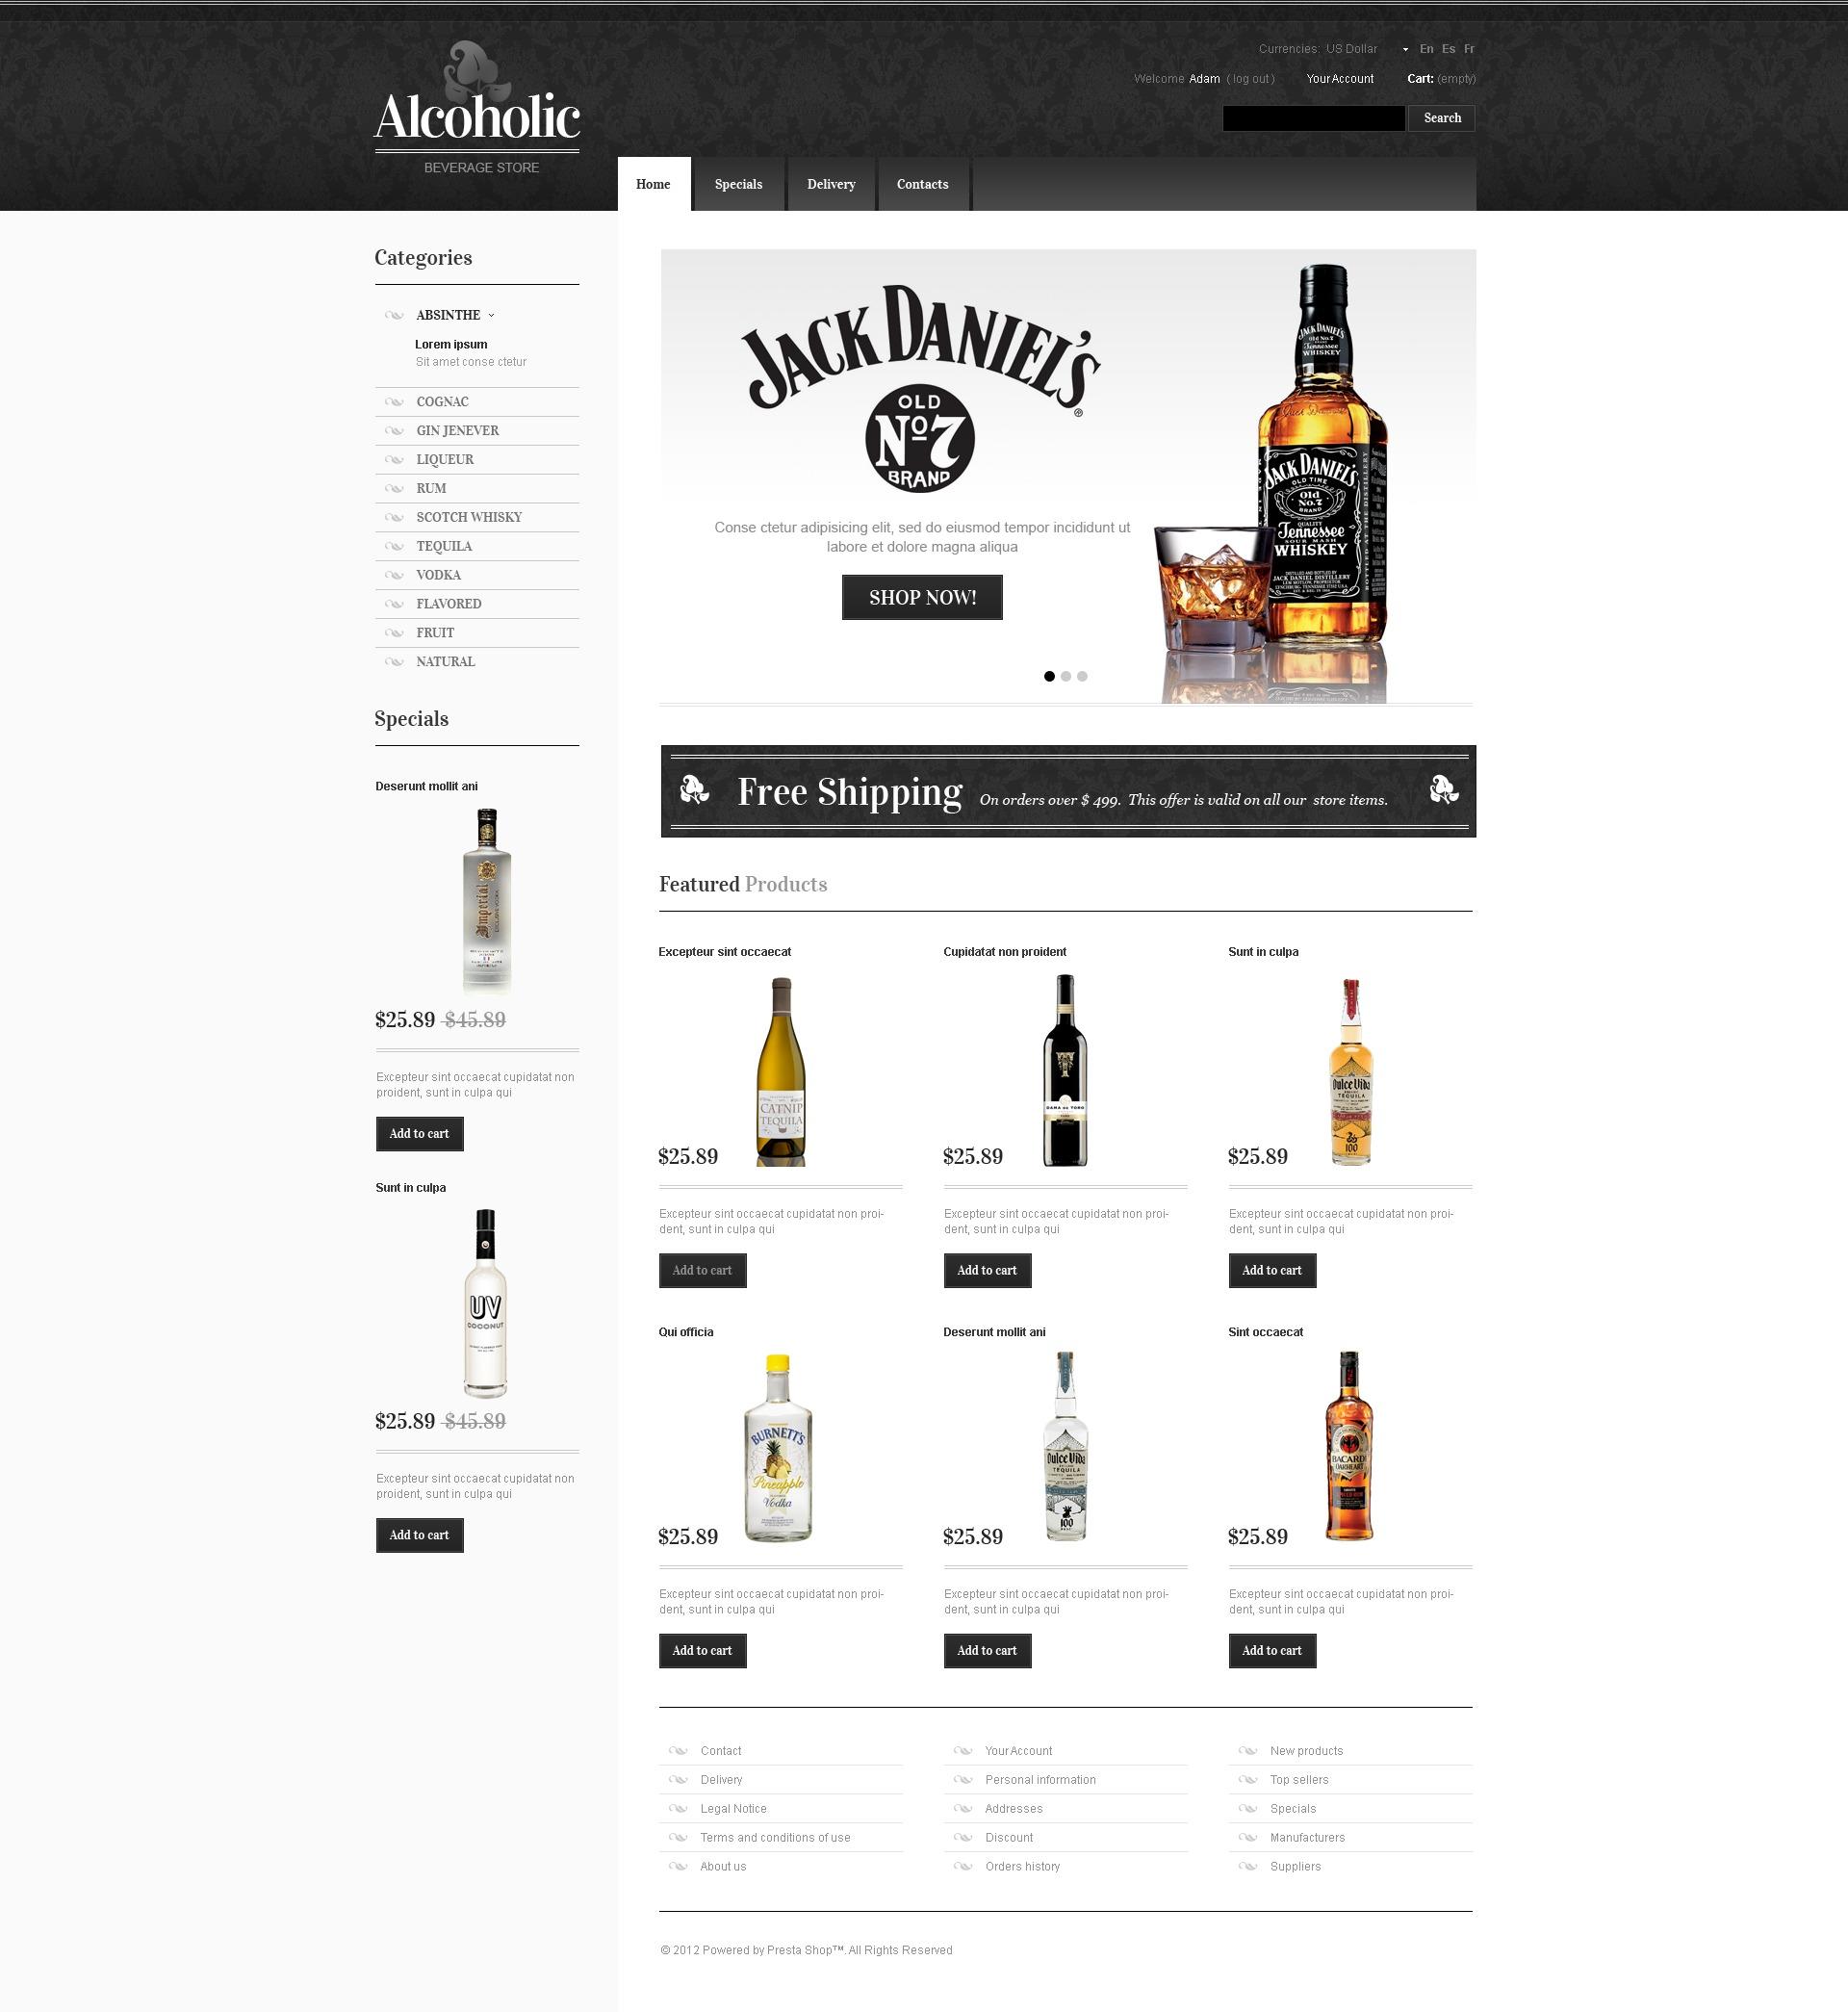 Aristocratic Alcohol OsCommerce Template #41328